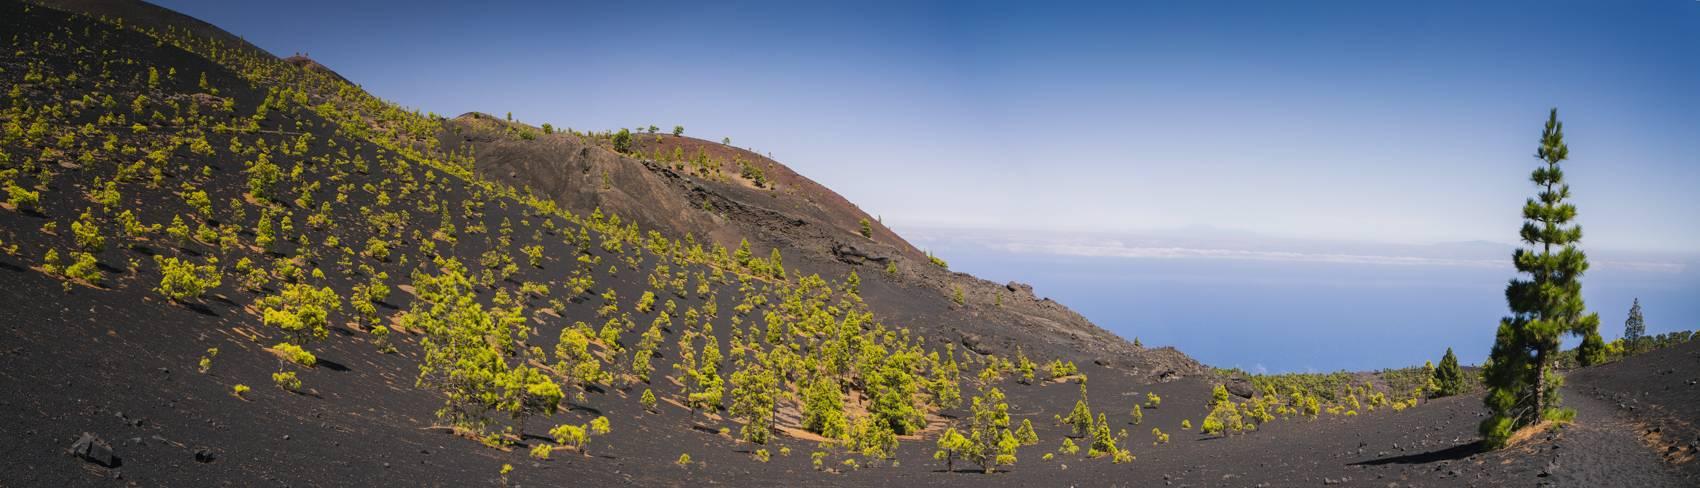 Photo Voyages : Îles Canaries #21